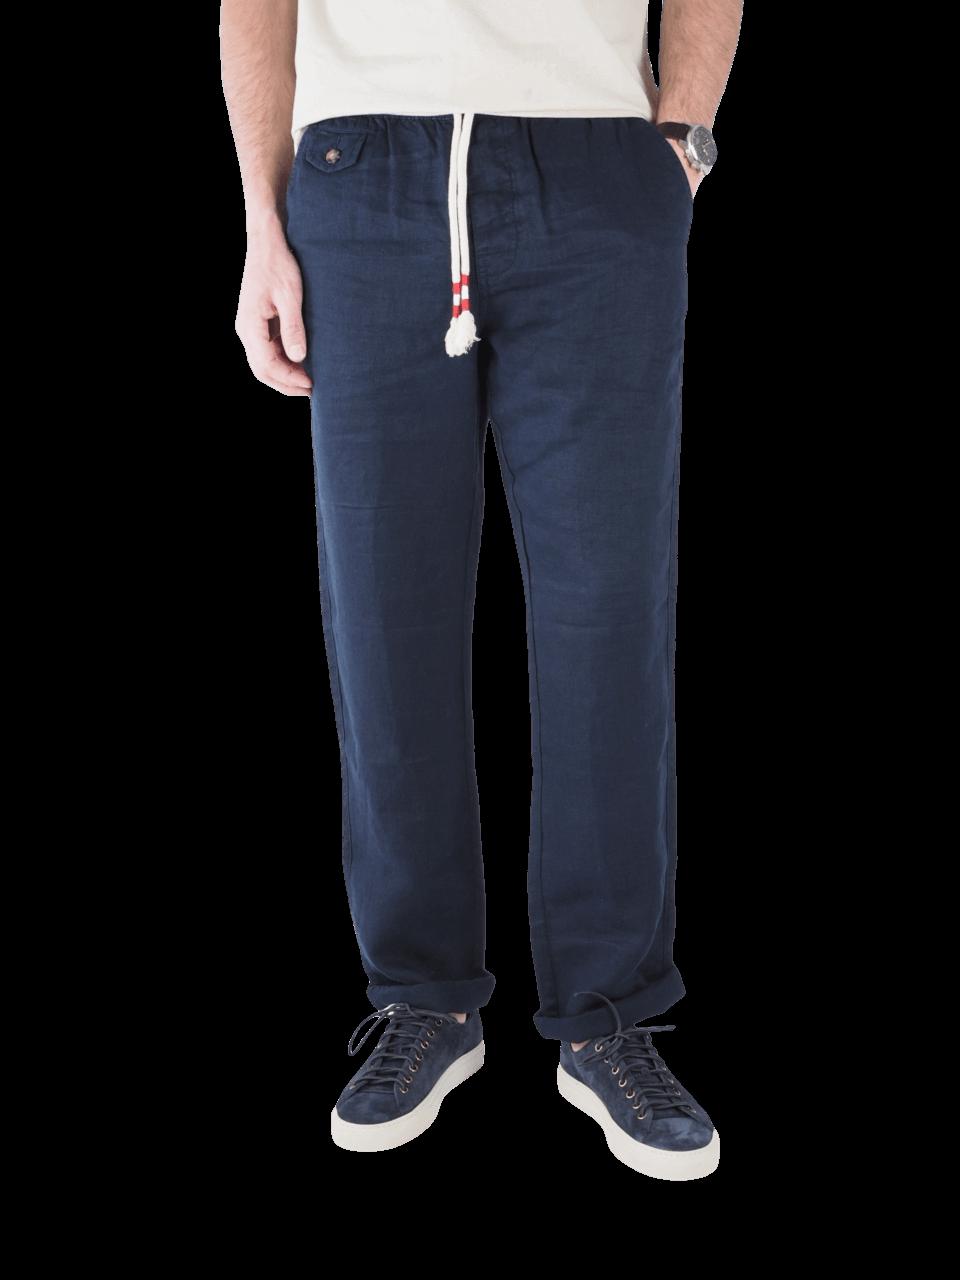 Mc2 trousers